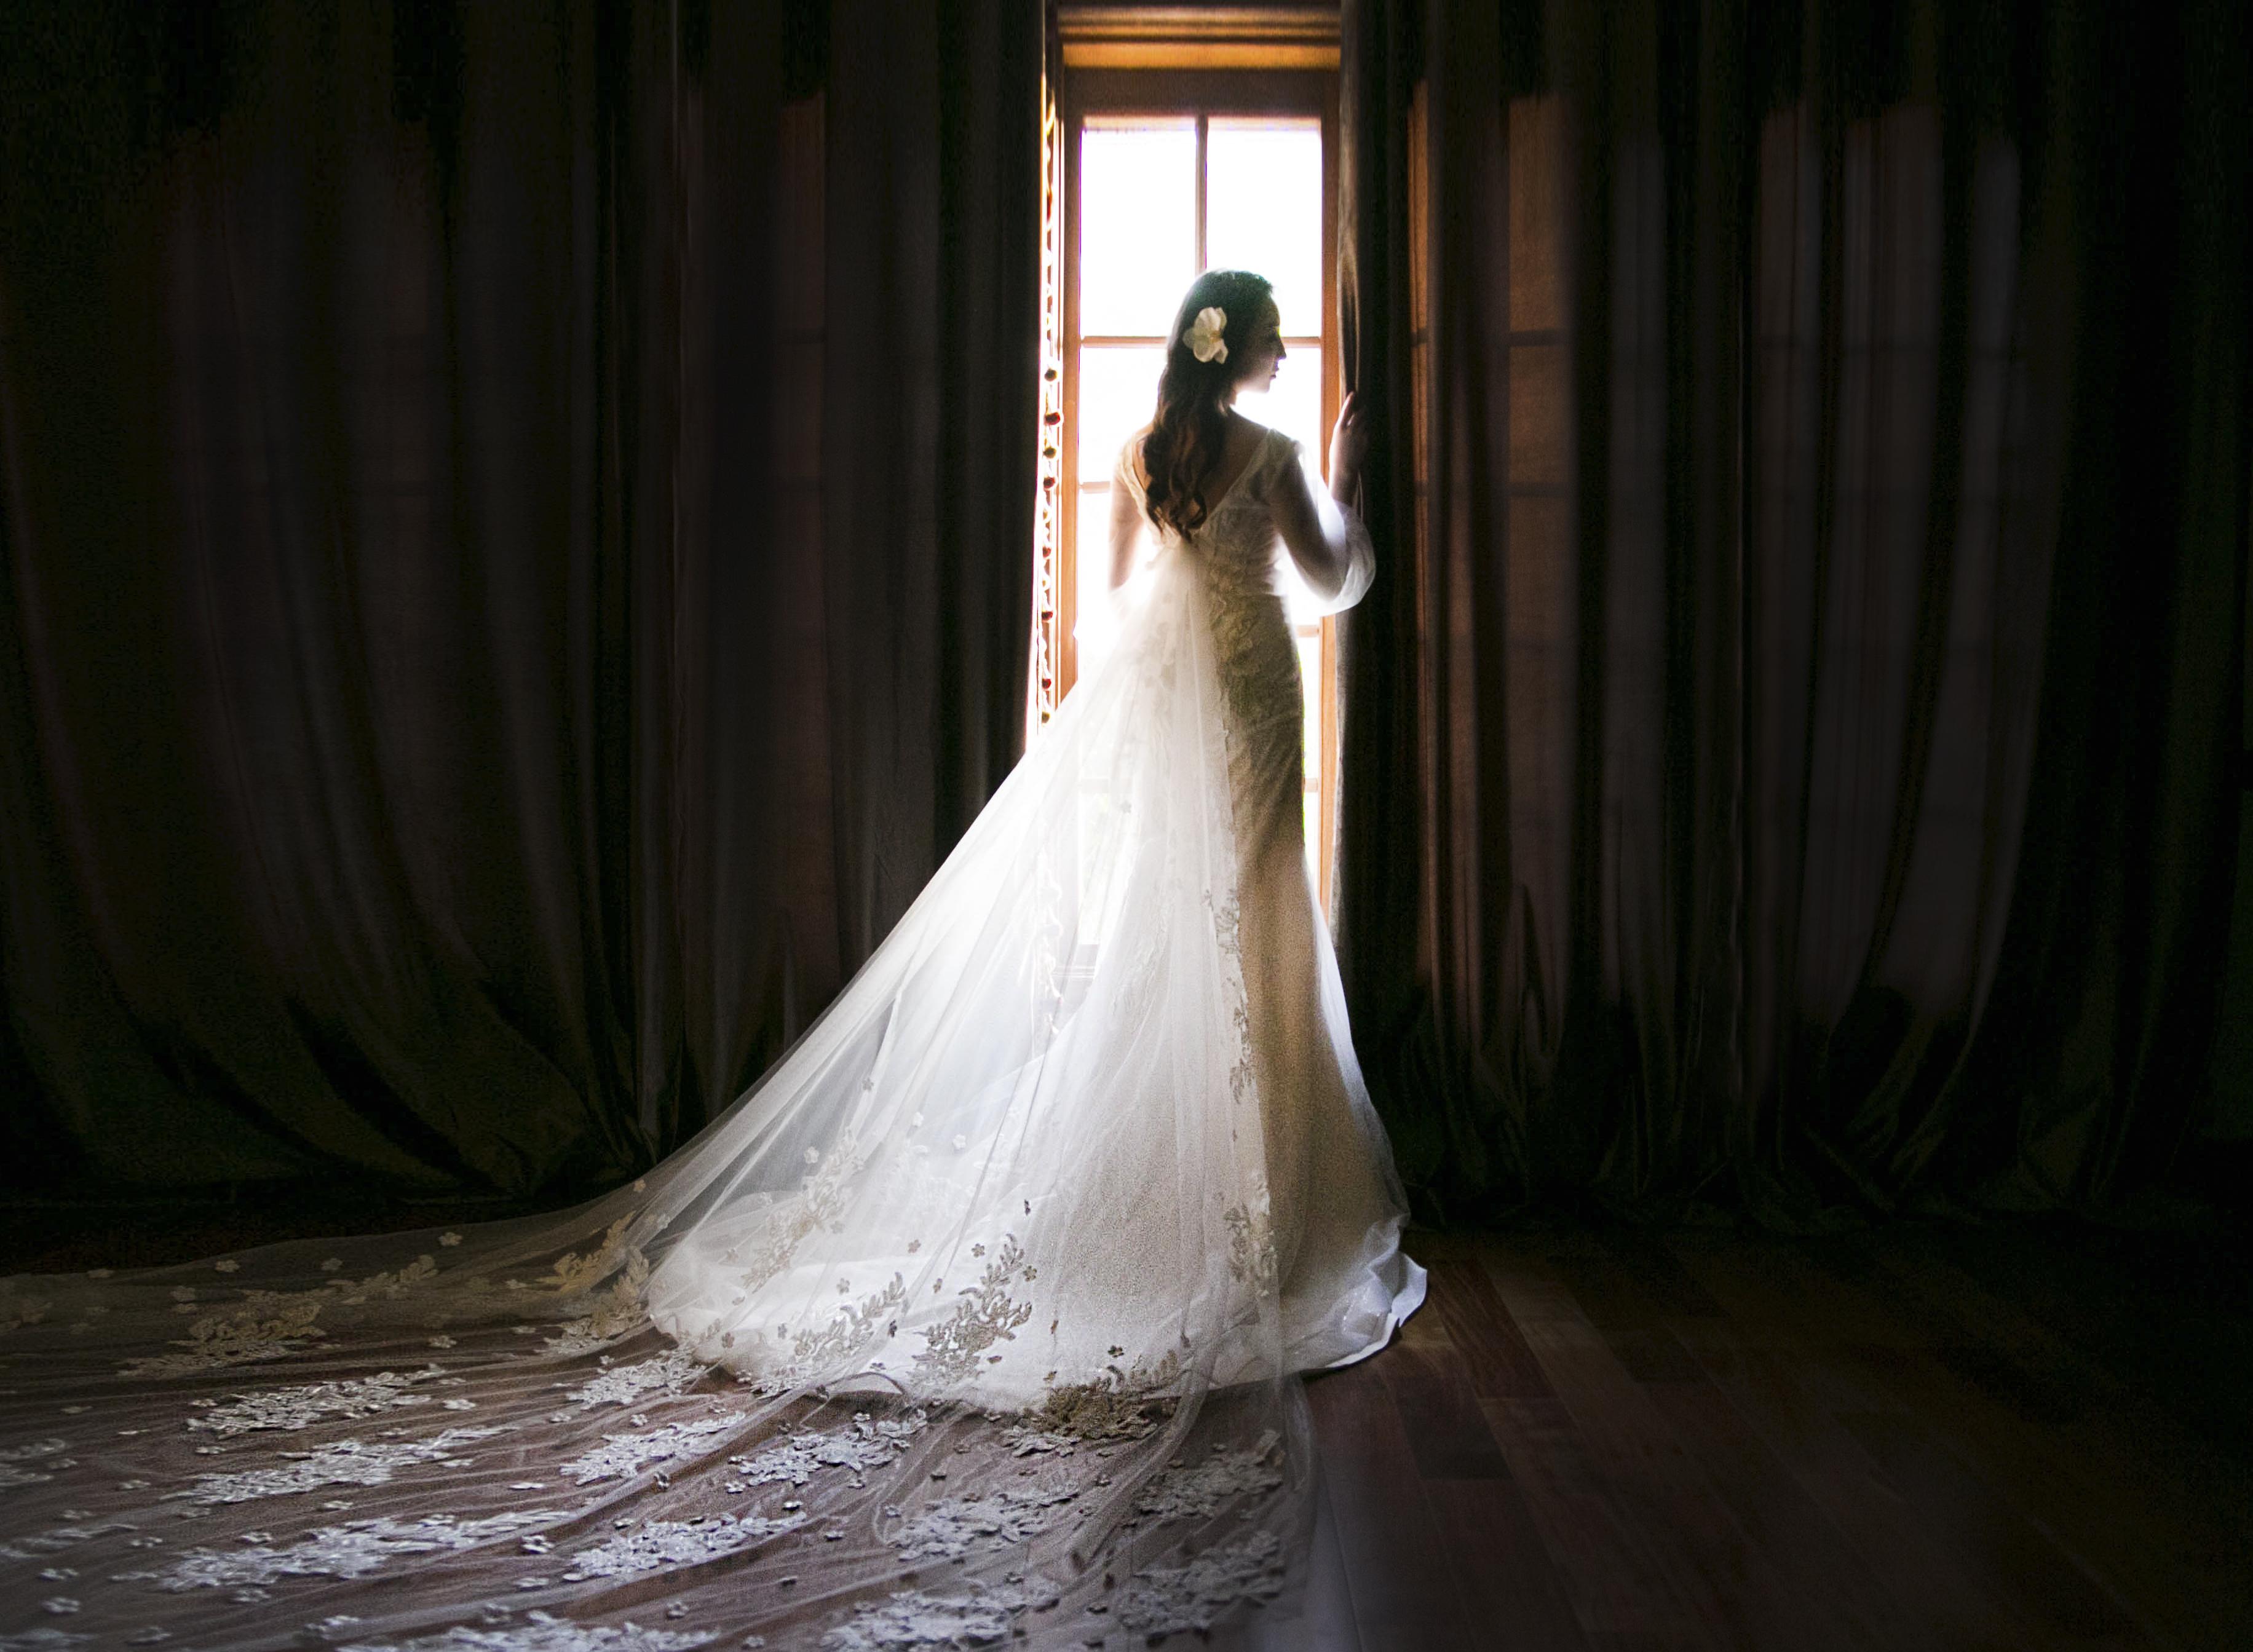 Prewedding photography in vancouver